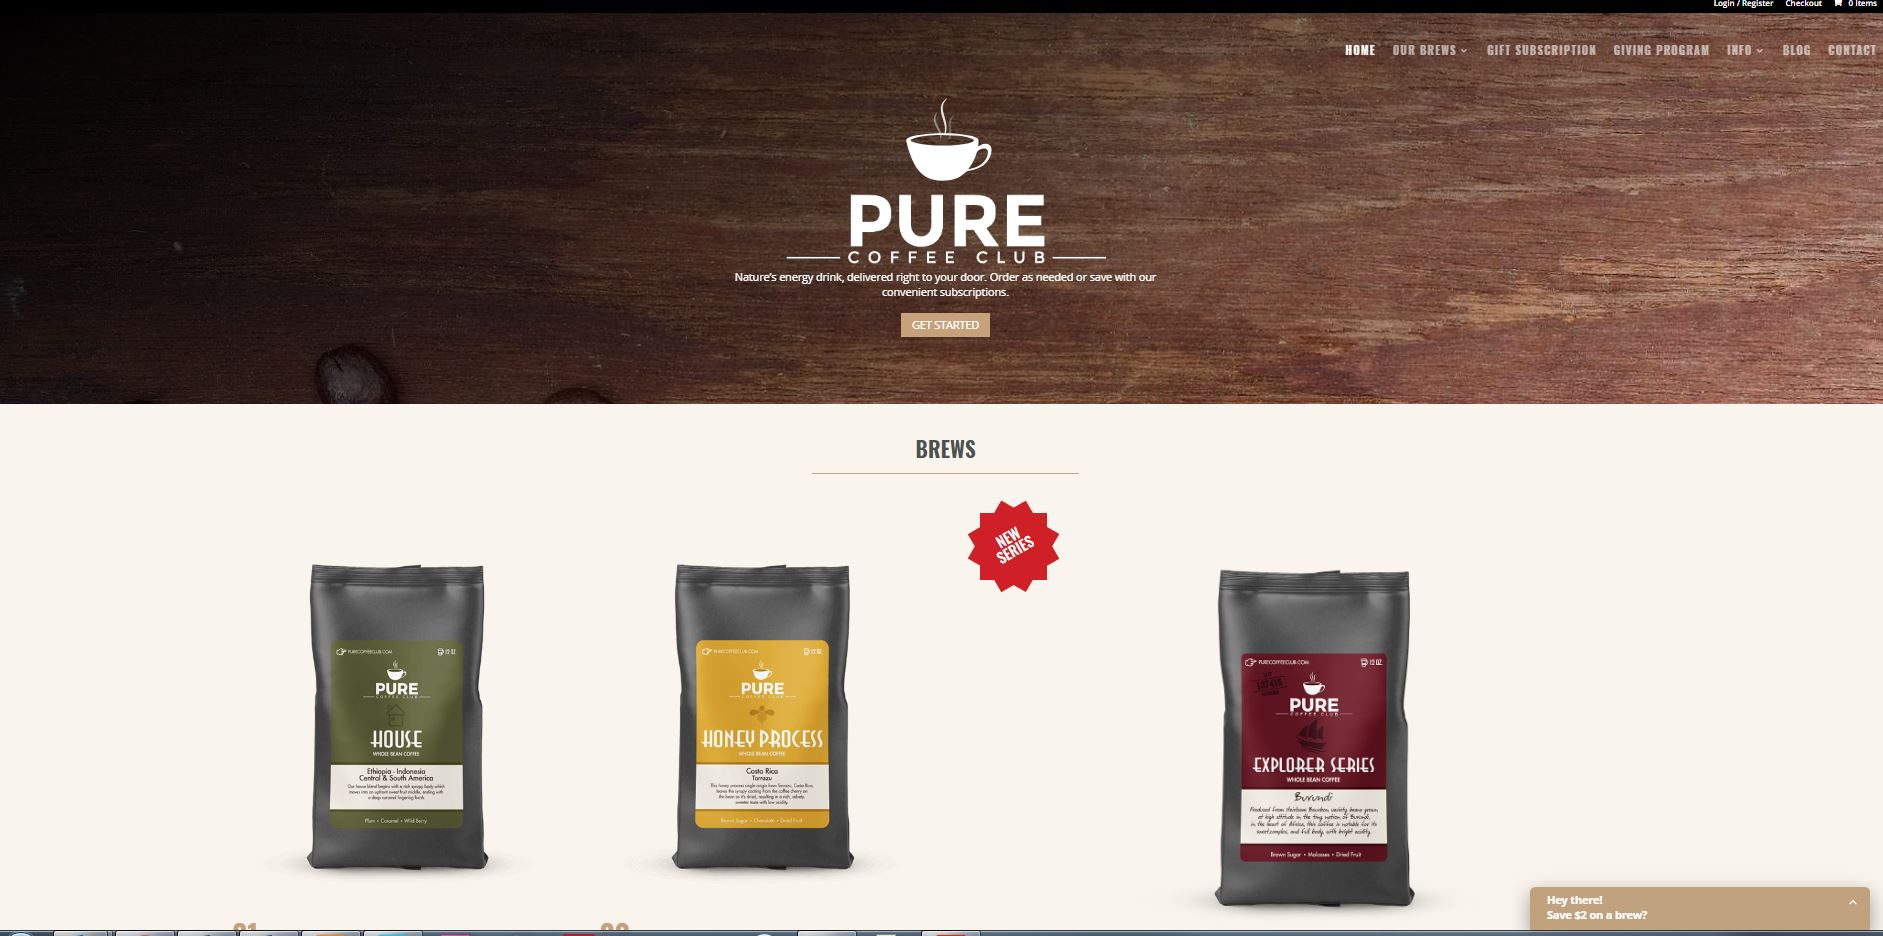 Pure Coffee Club